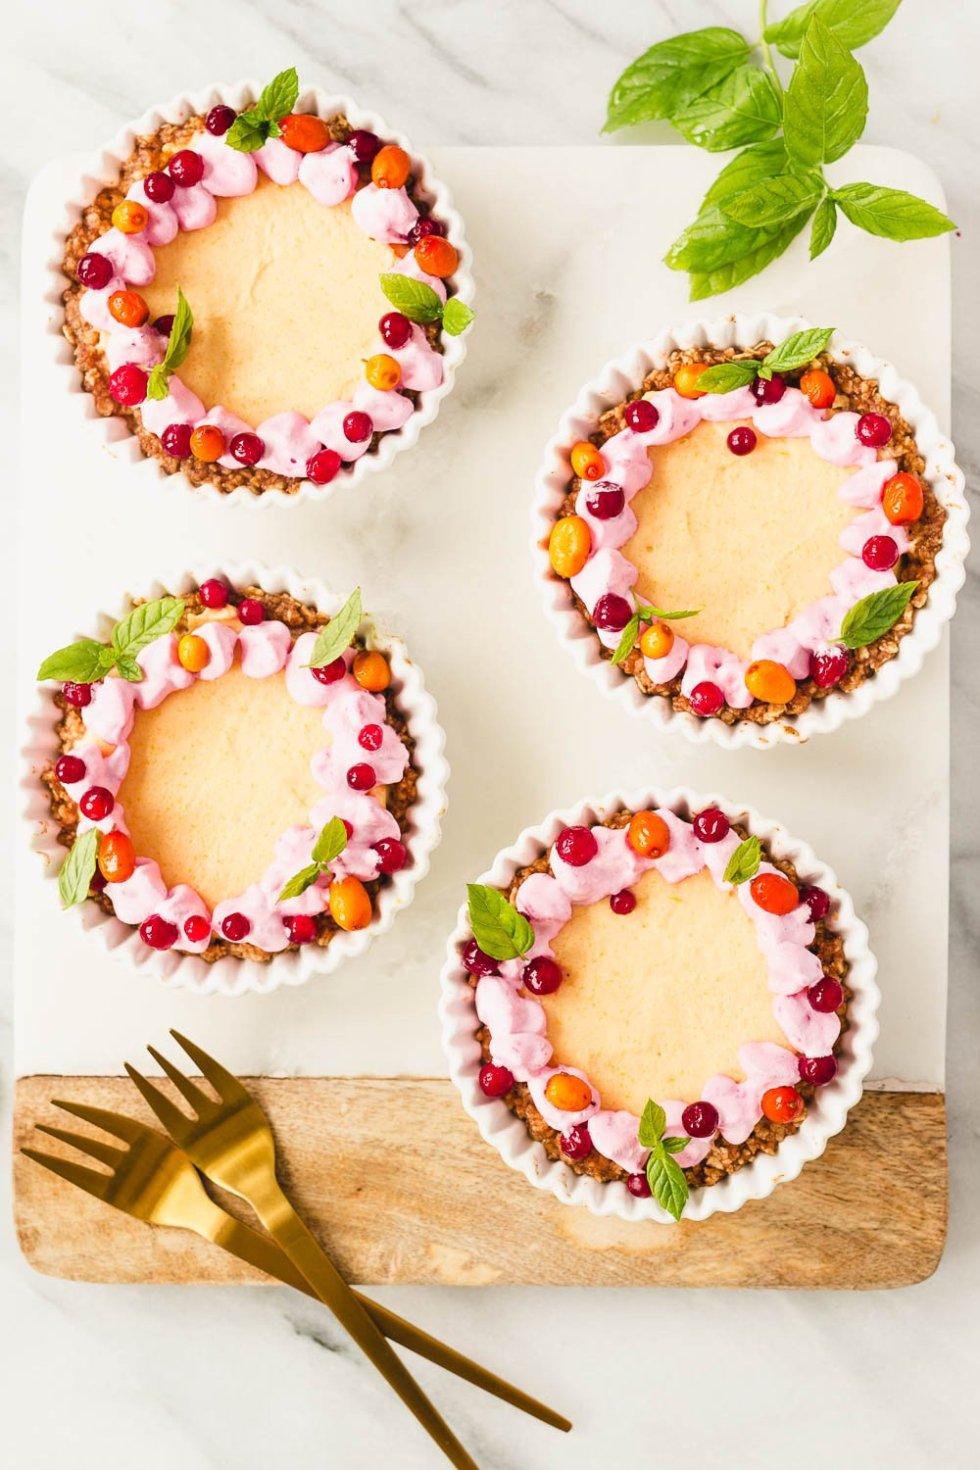 Vegan No-bake Pumpkin Tiramisu Tart